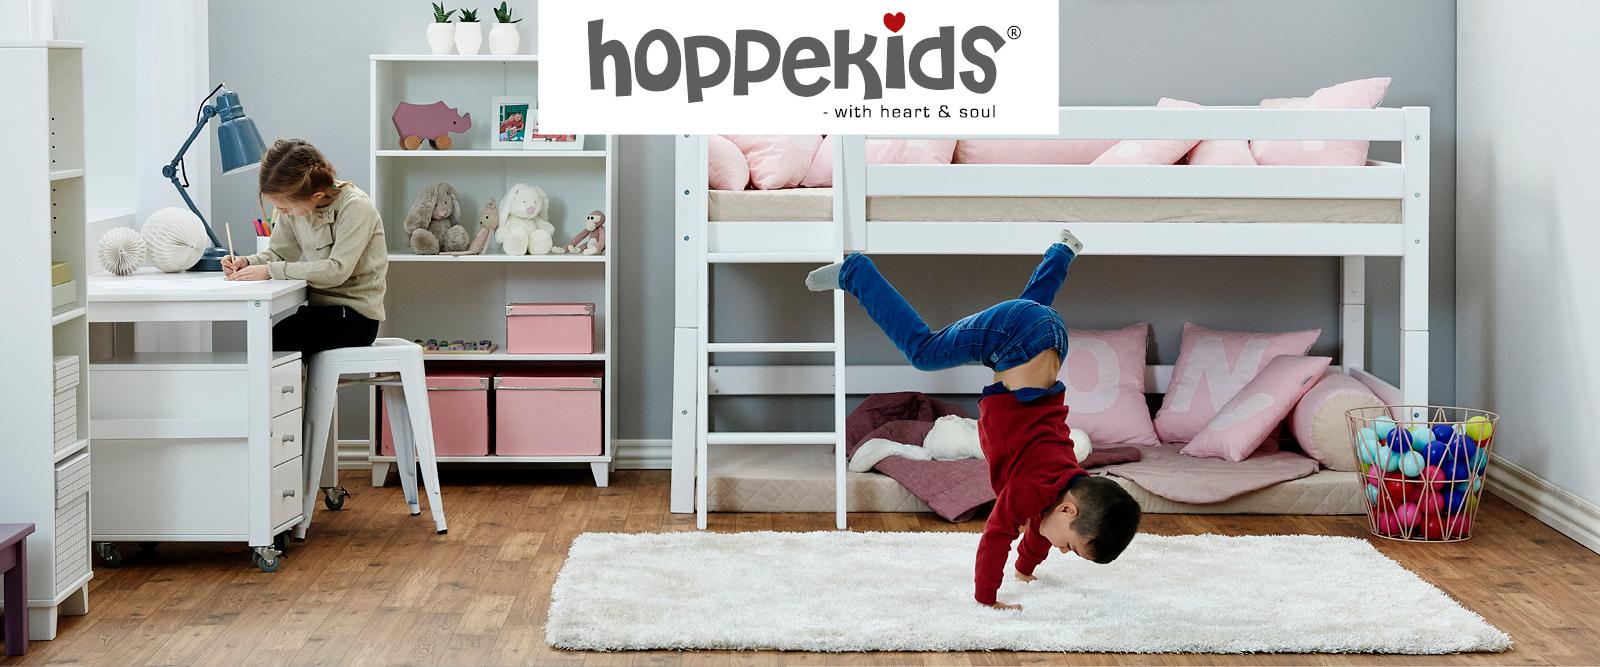 Hoppekids Nettbutikk hos Mimmis.no